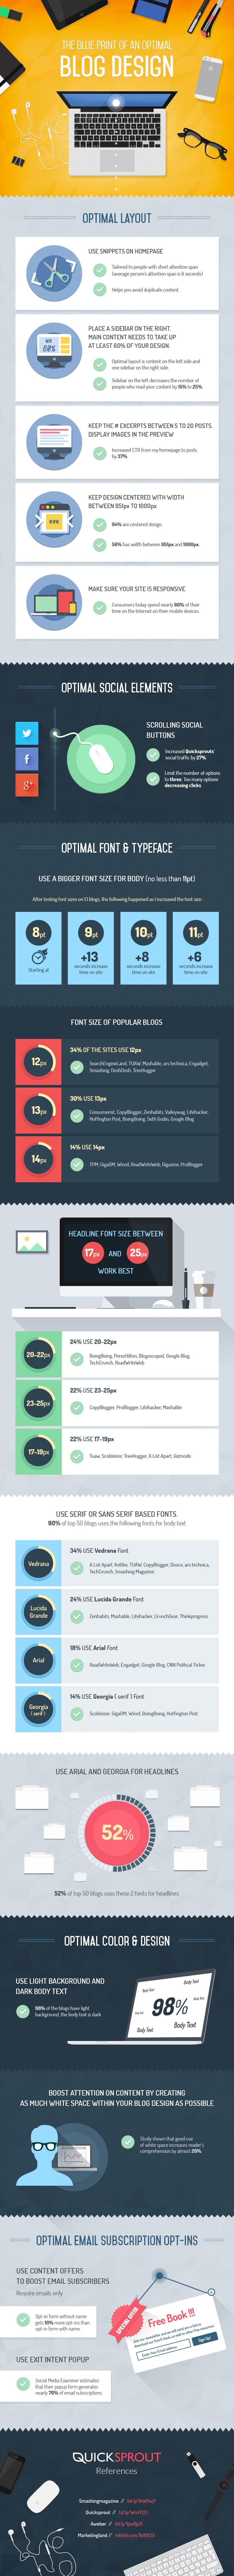 Infografía-diseño-de-un-blog